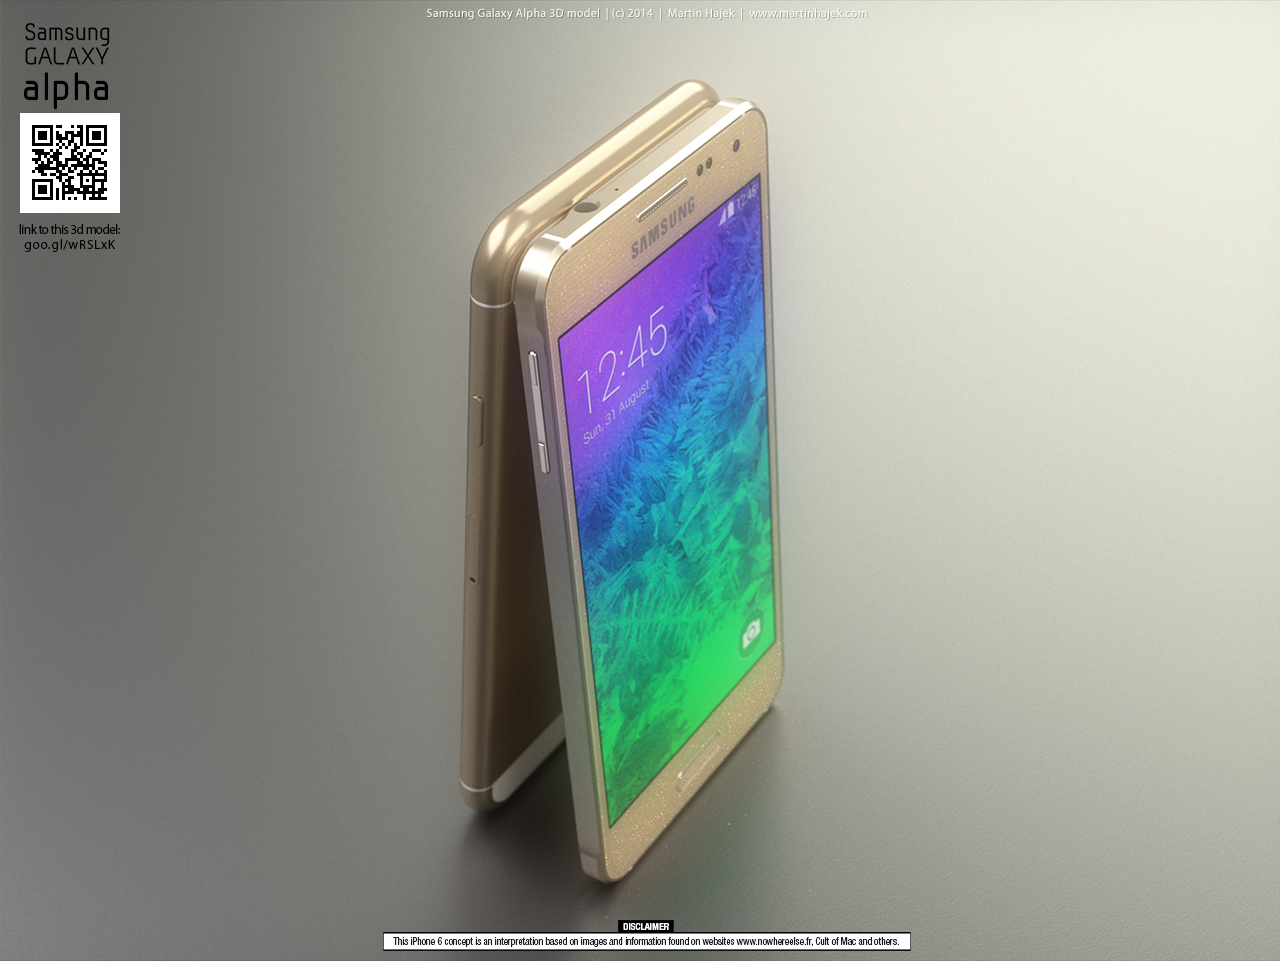 iPhone-6-vs-Galaxy-Alpha_04